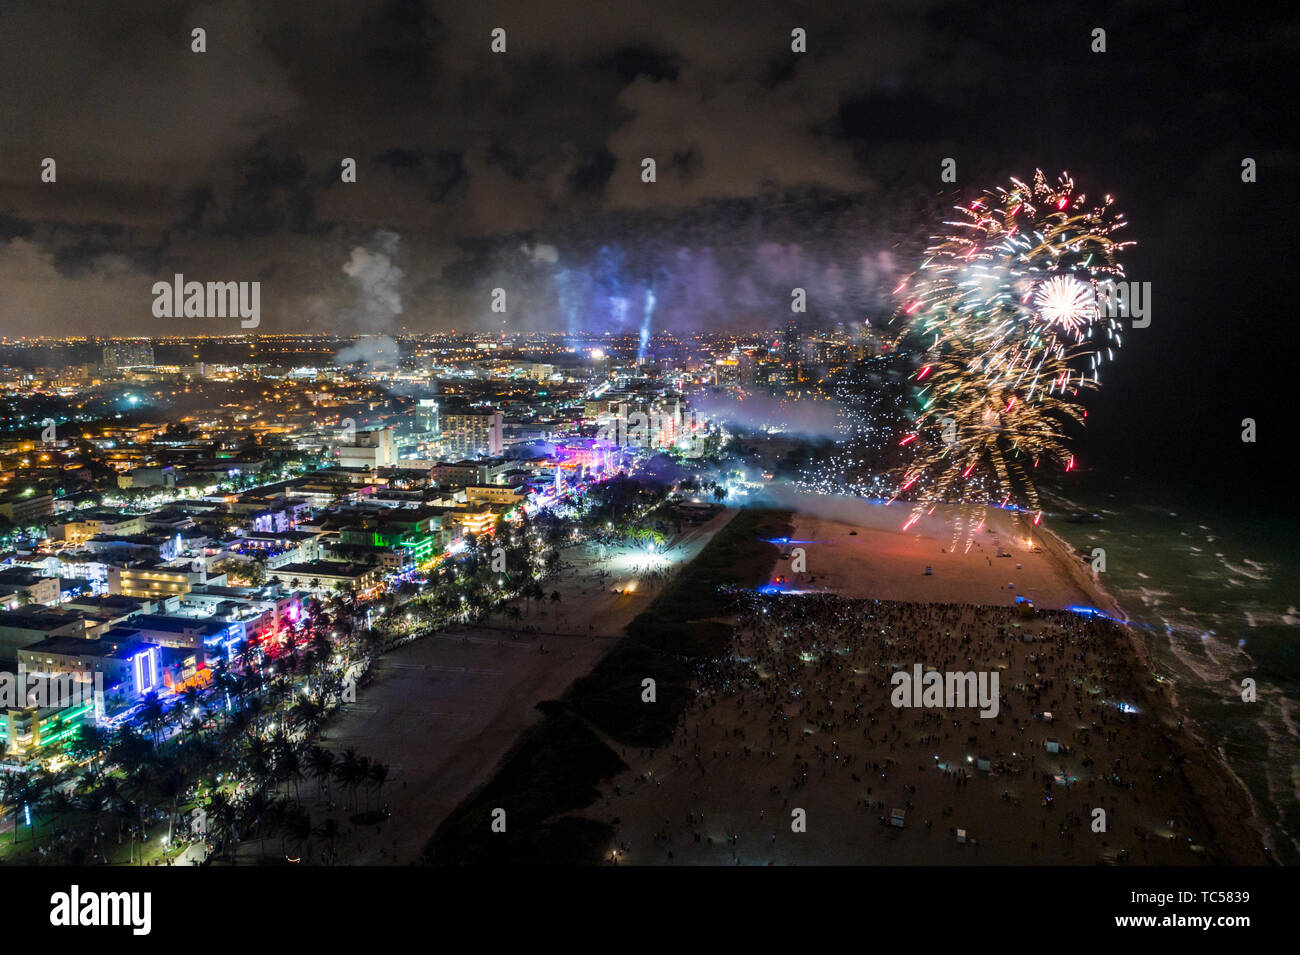 Miami Beach Florida New Year's Eve fireworks display celebration aerial overhead view above bird's eye - Stock Image